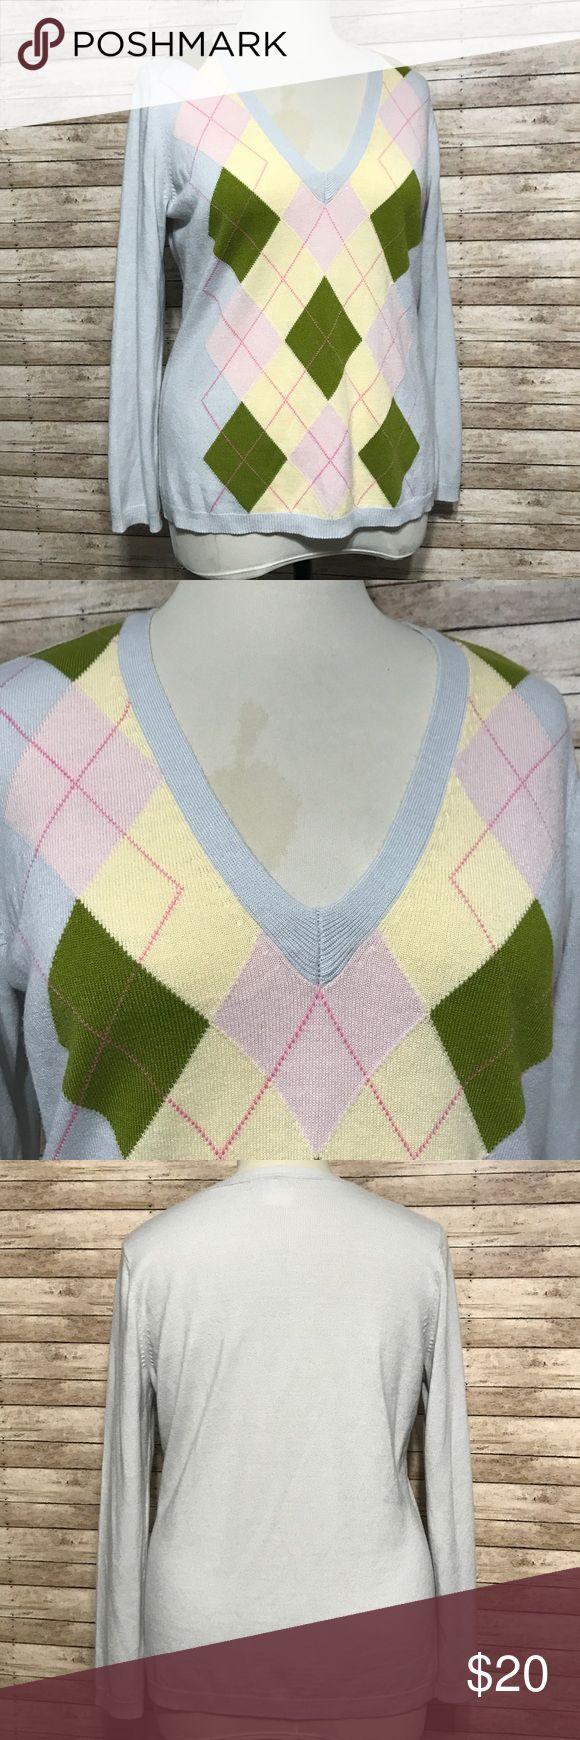 Best 25  Argyle ny ideas on Pinterest | Argyle sweaters, Teacher ...